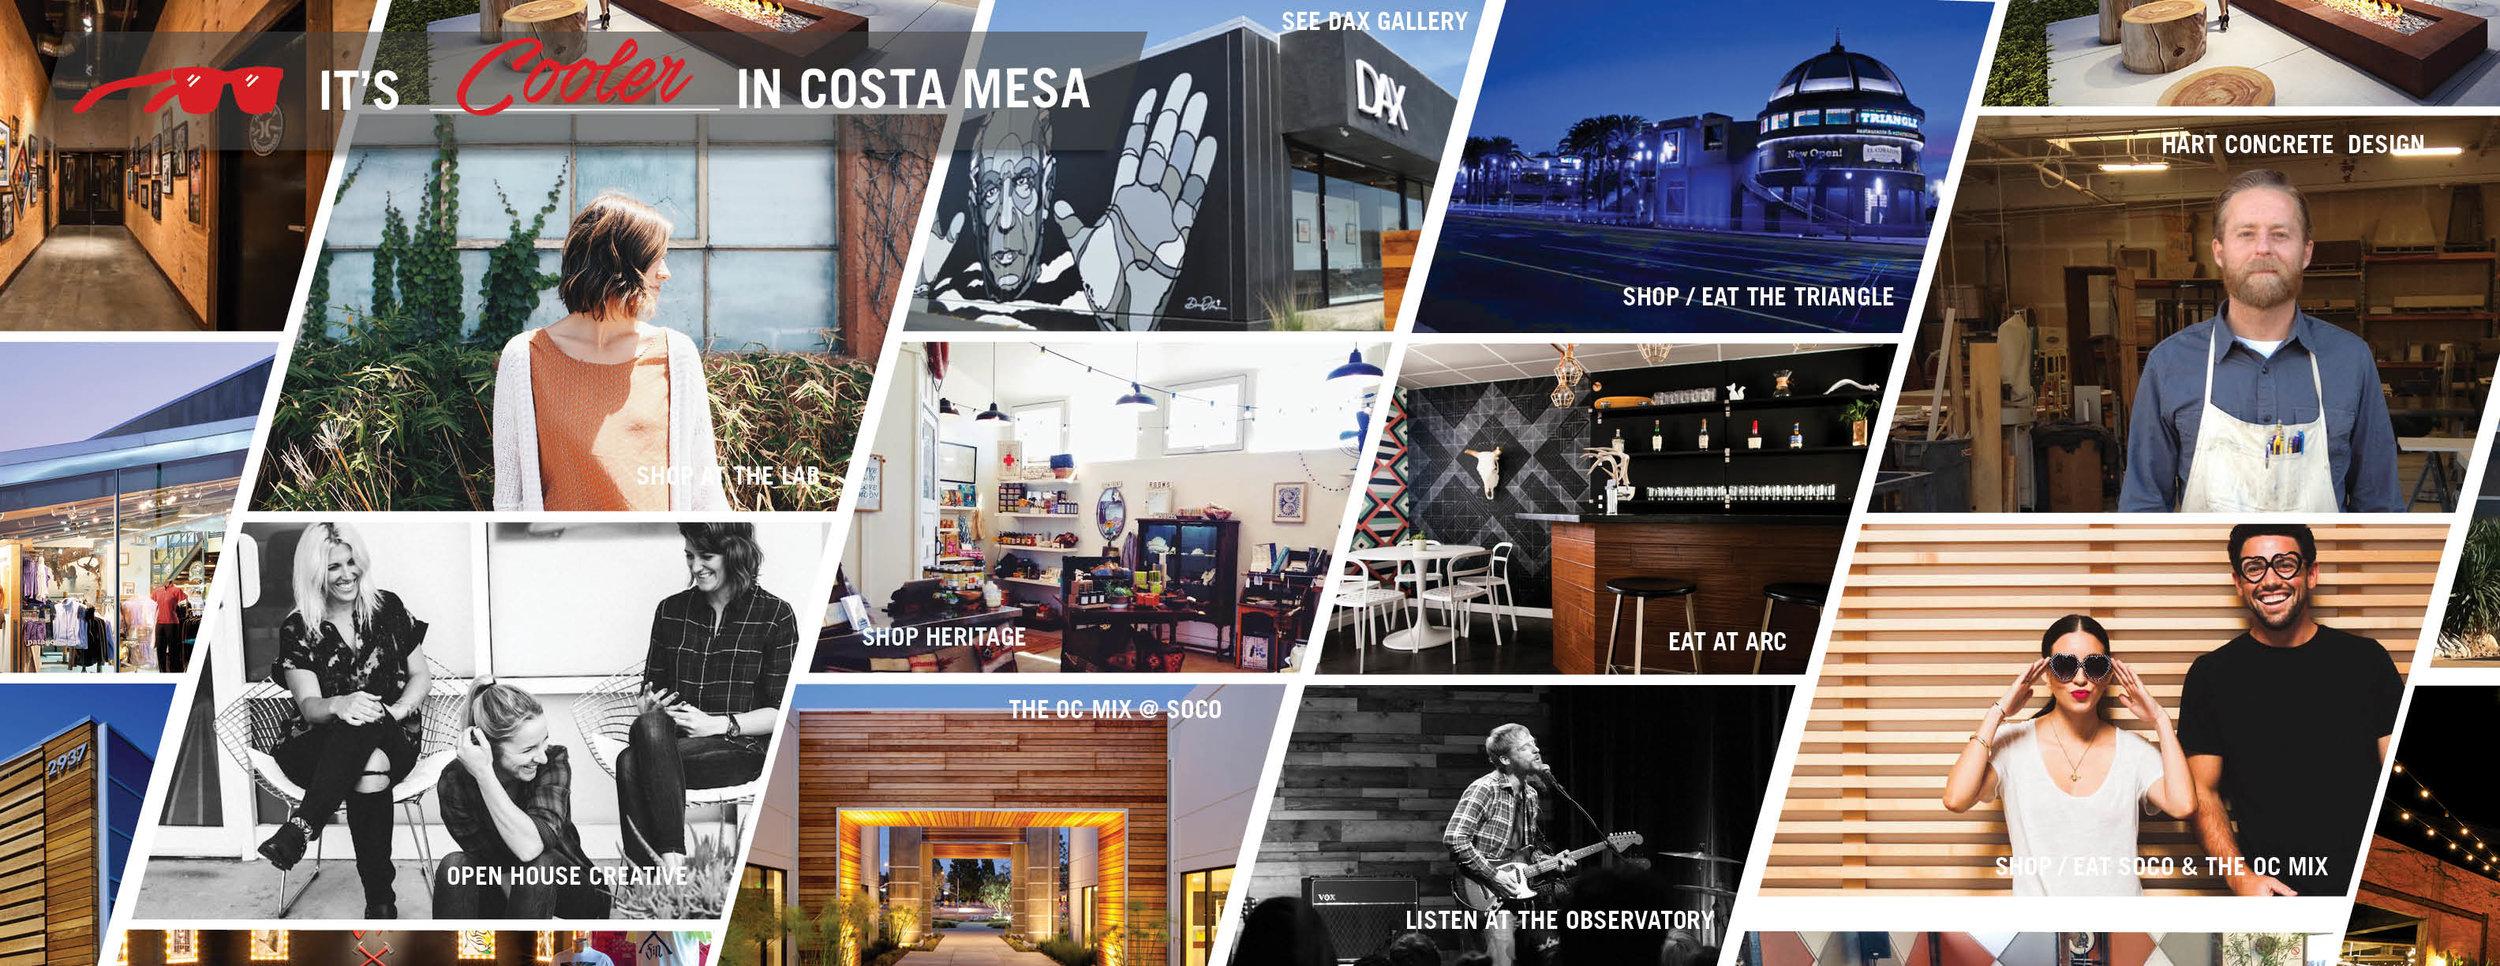 The-MET-Costa-Mesa-13.jpg